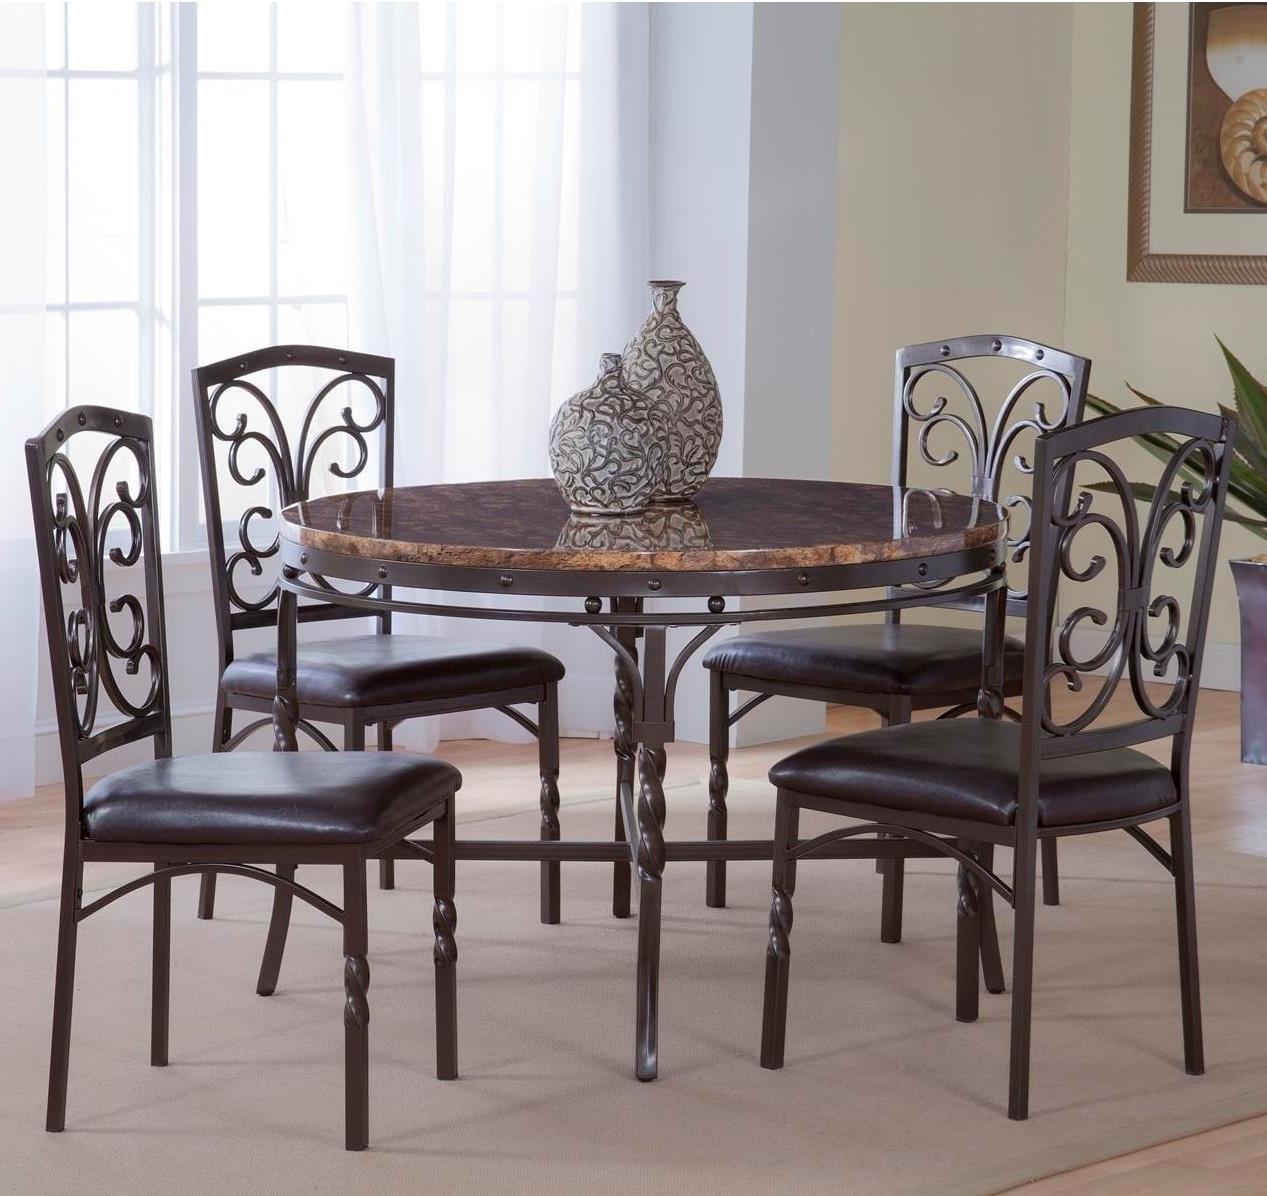 Bernards Tuscan -Piece MetalFaux Marble Dinette Table Set